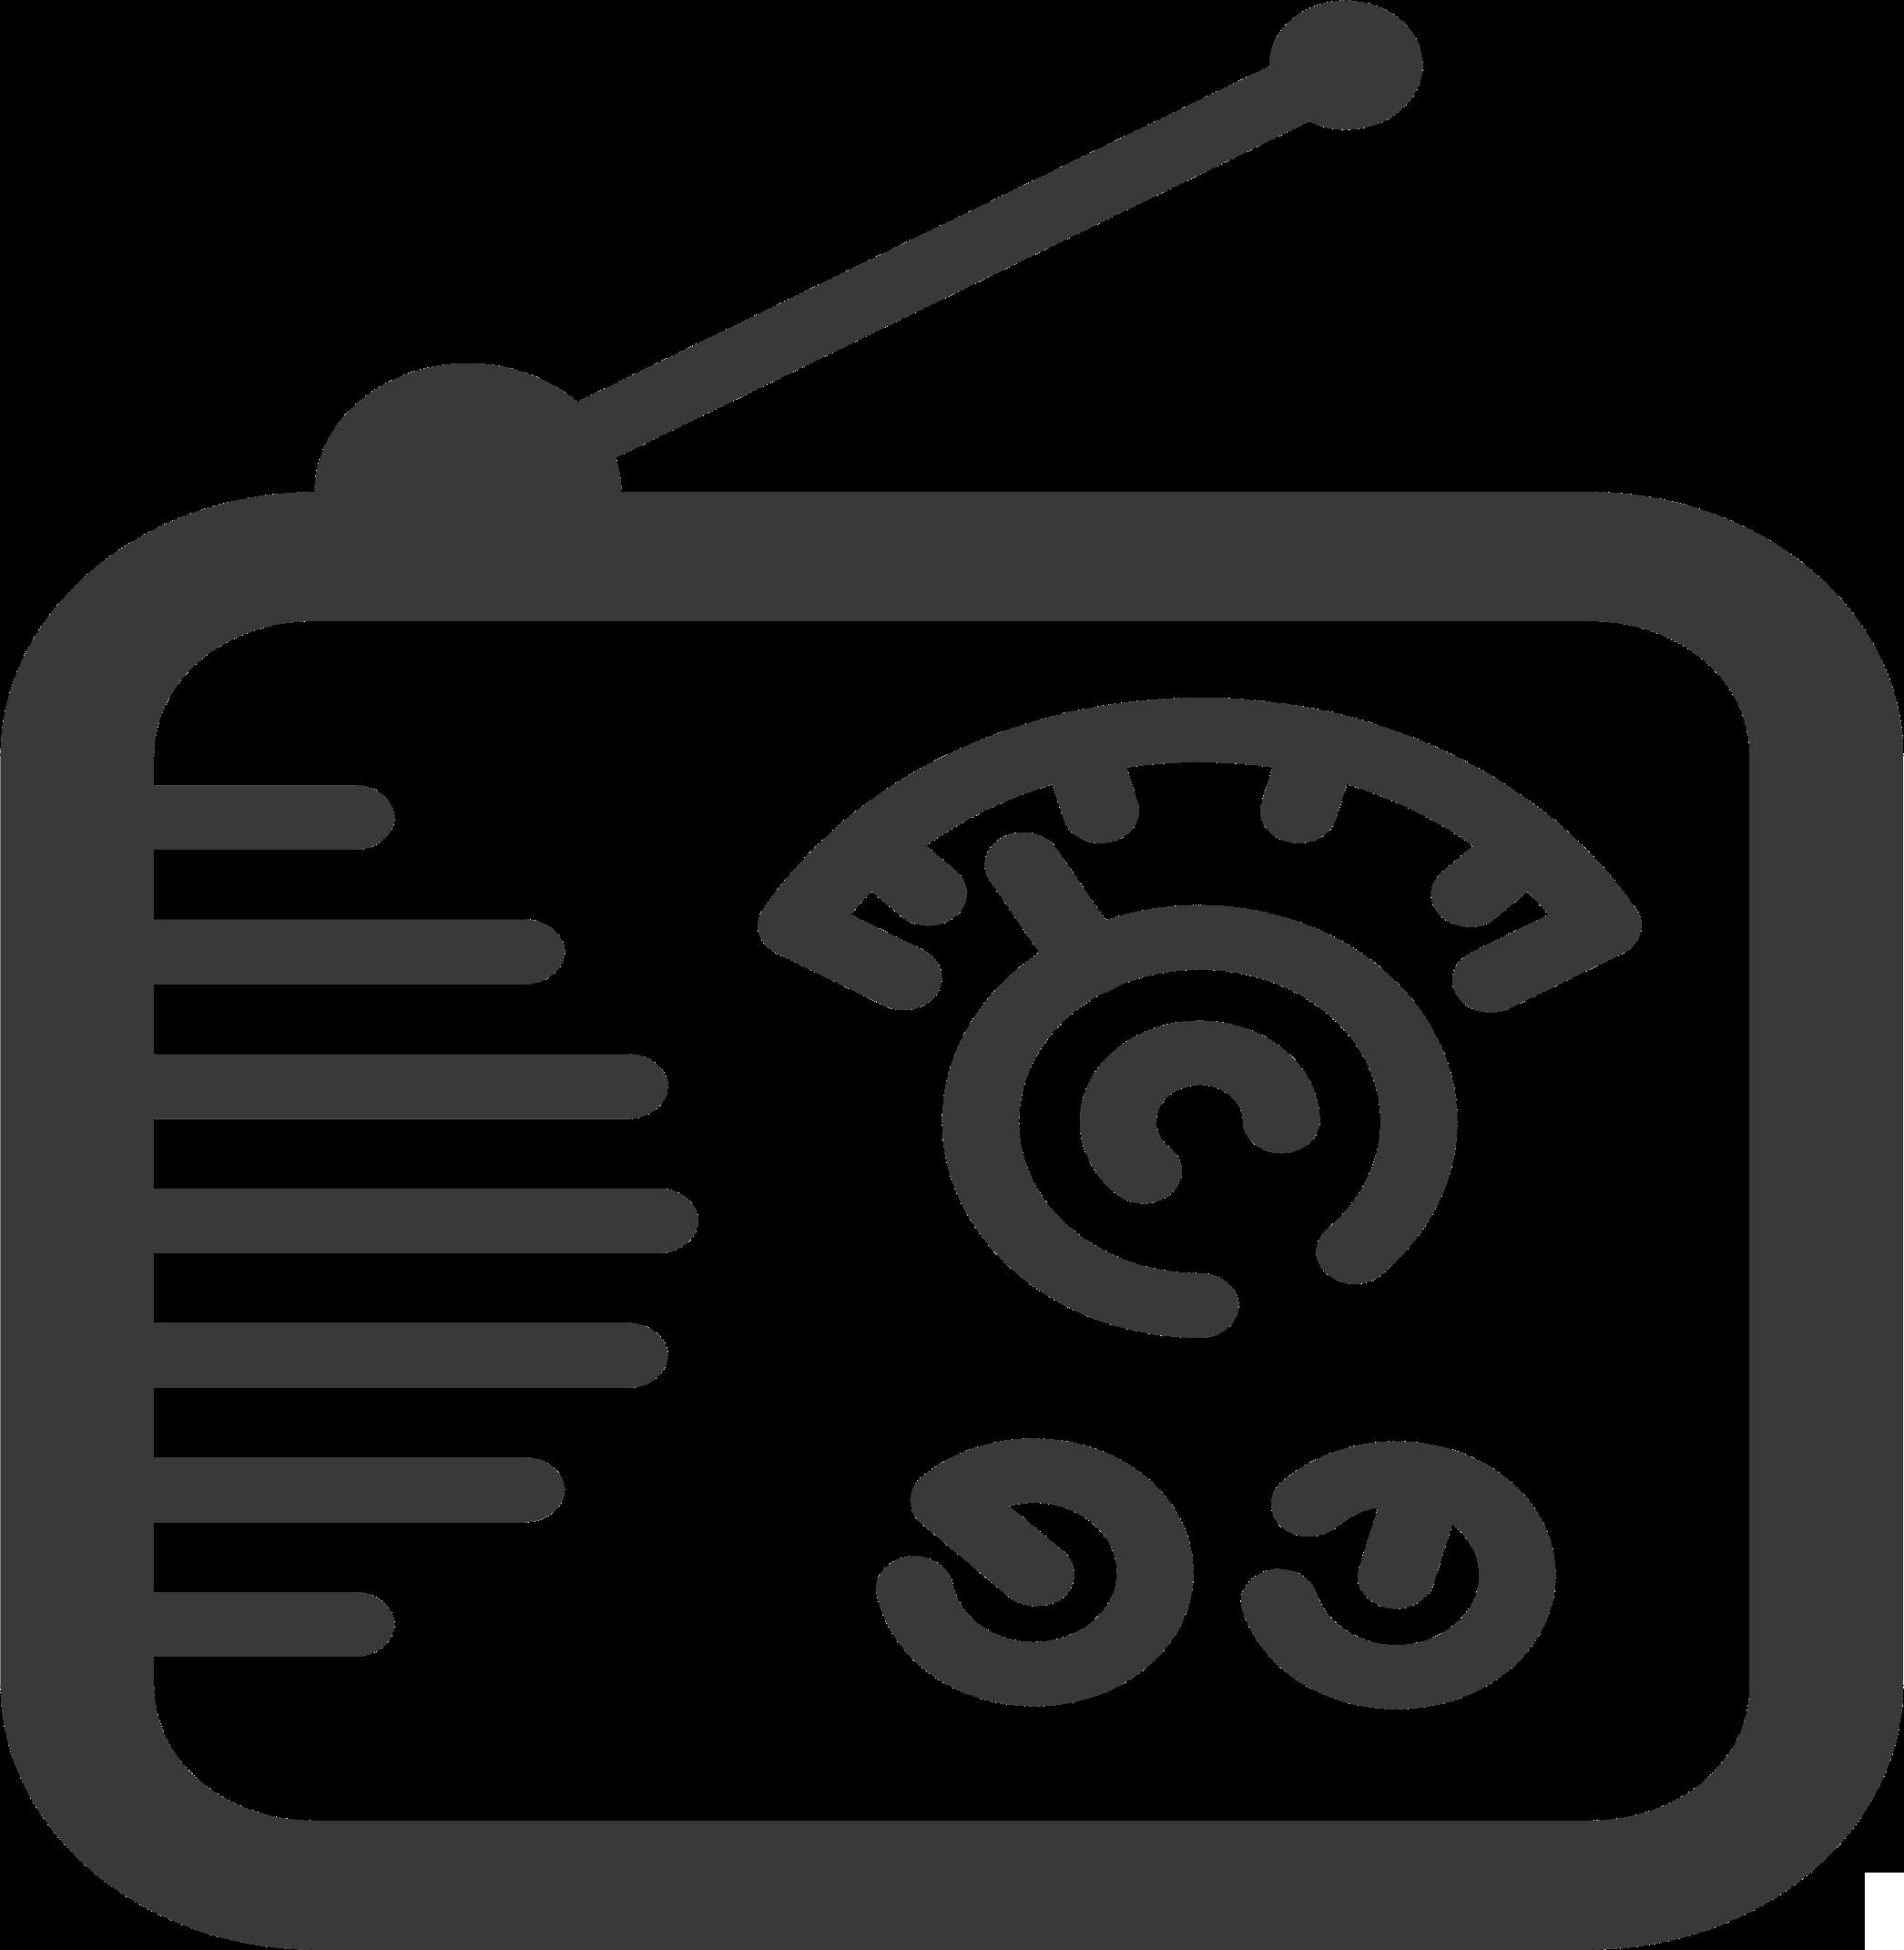 Radio Icon Vector Clipart image.